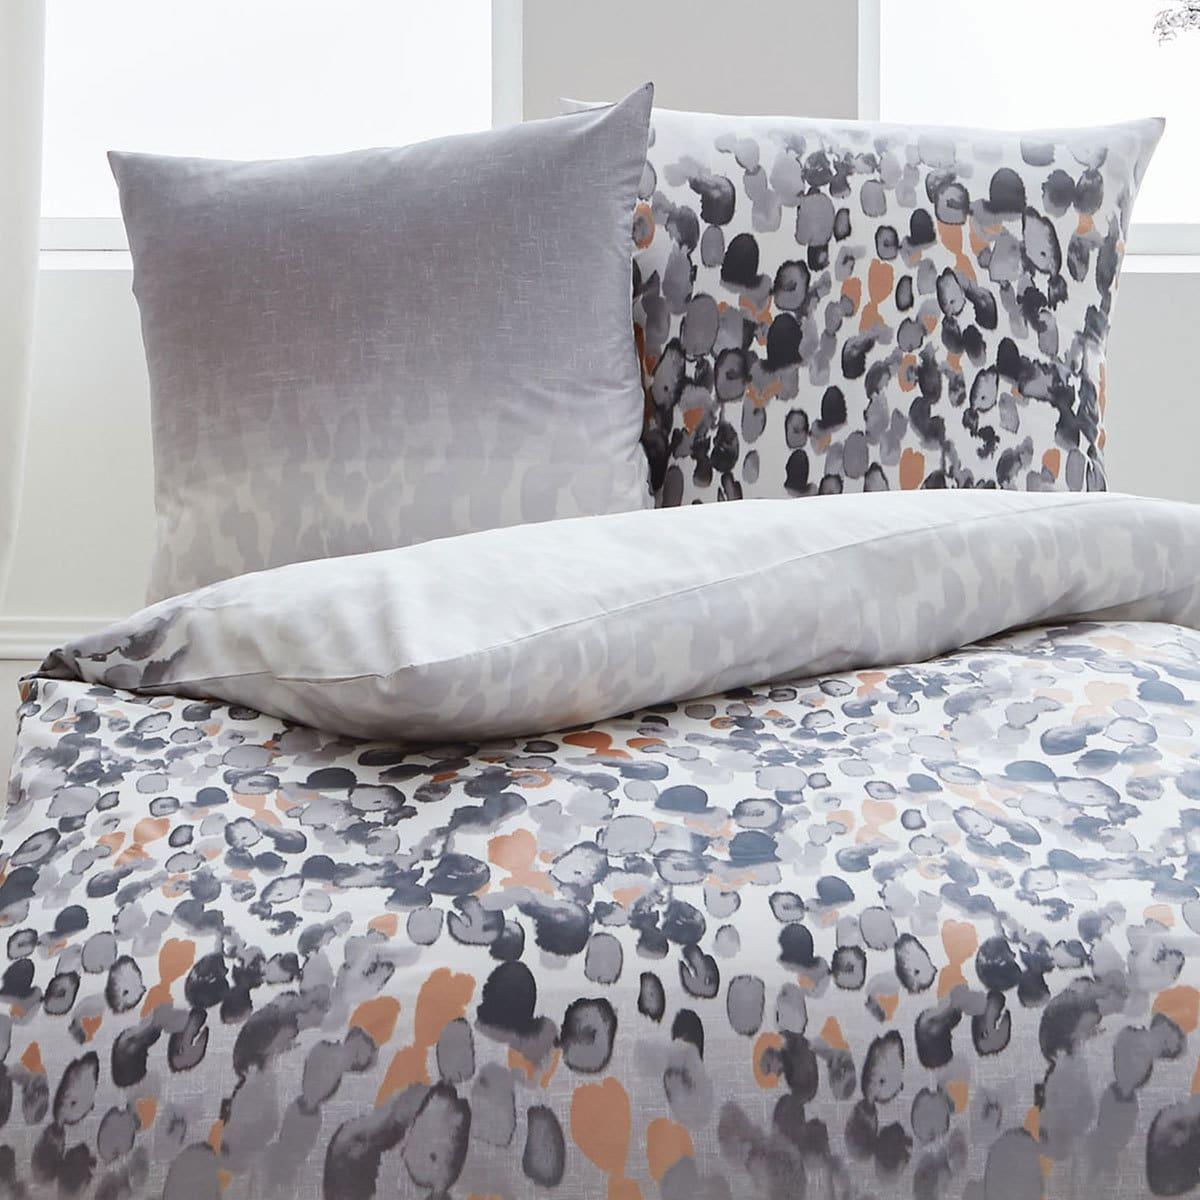 kaeppel biber bettw sche daytona grau g nstig online kaufen bei bettwaren shop. Black Bedroom Furniture Sets. Home Design Ideas